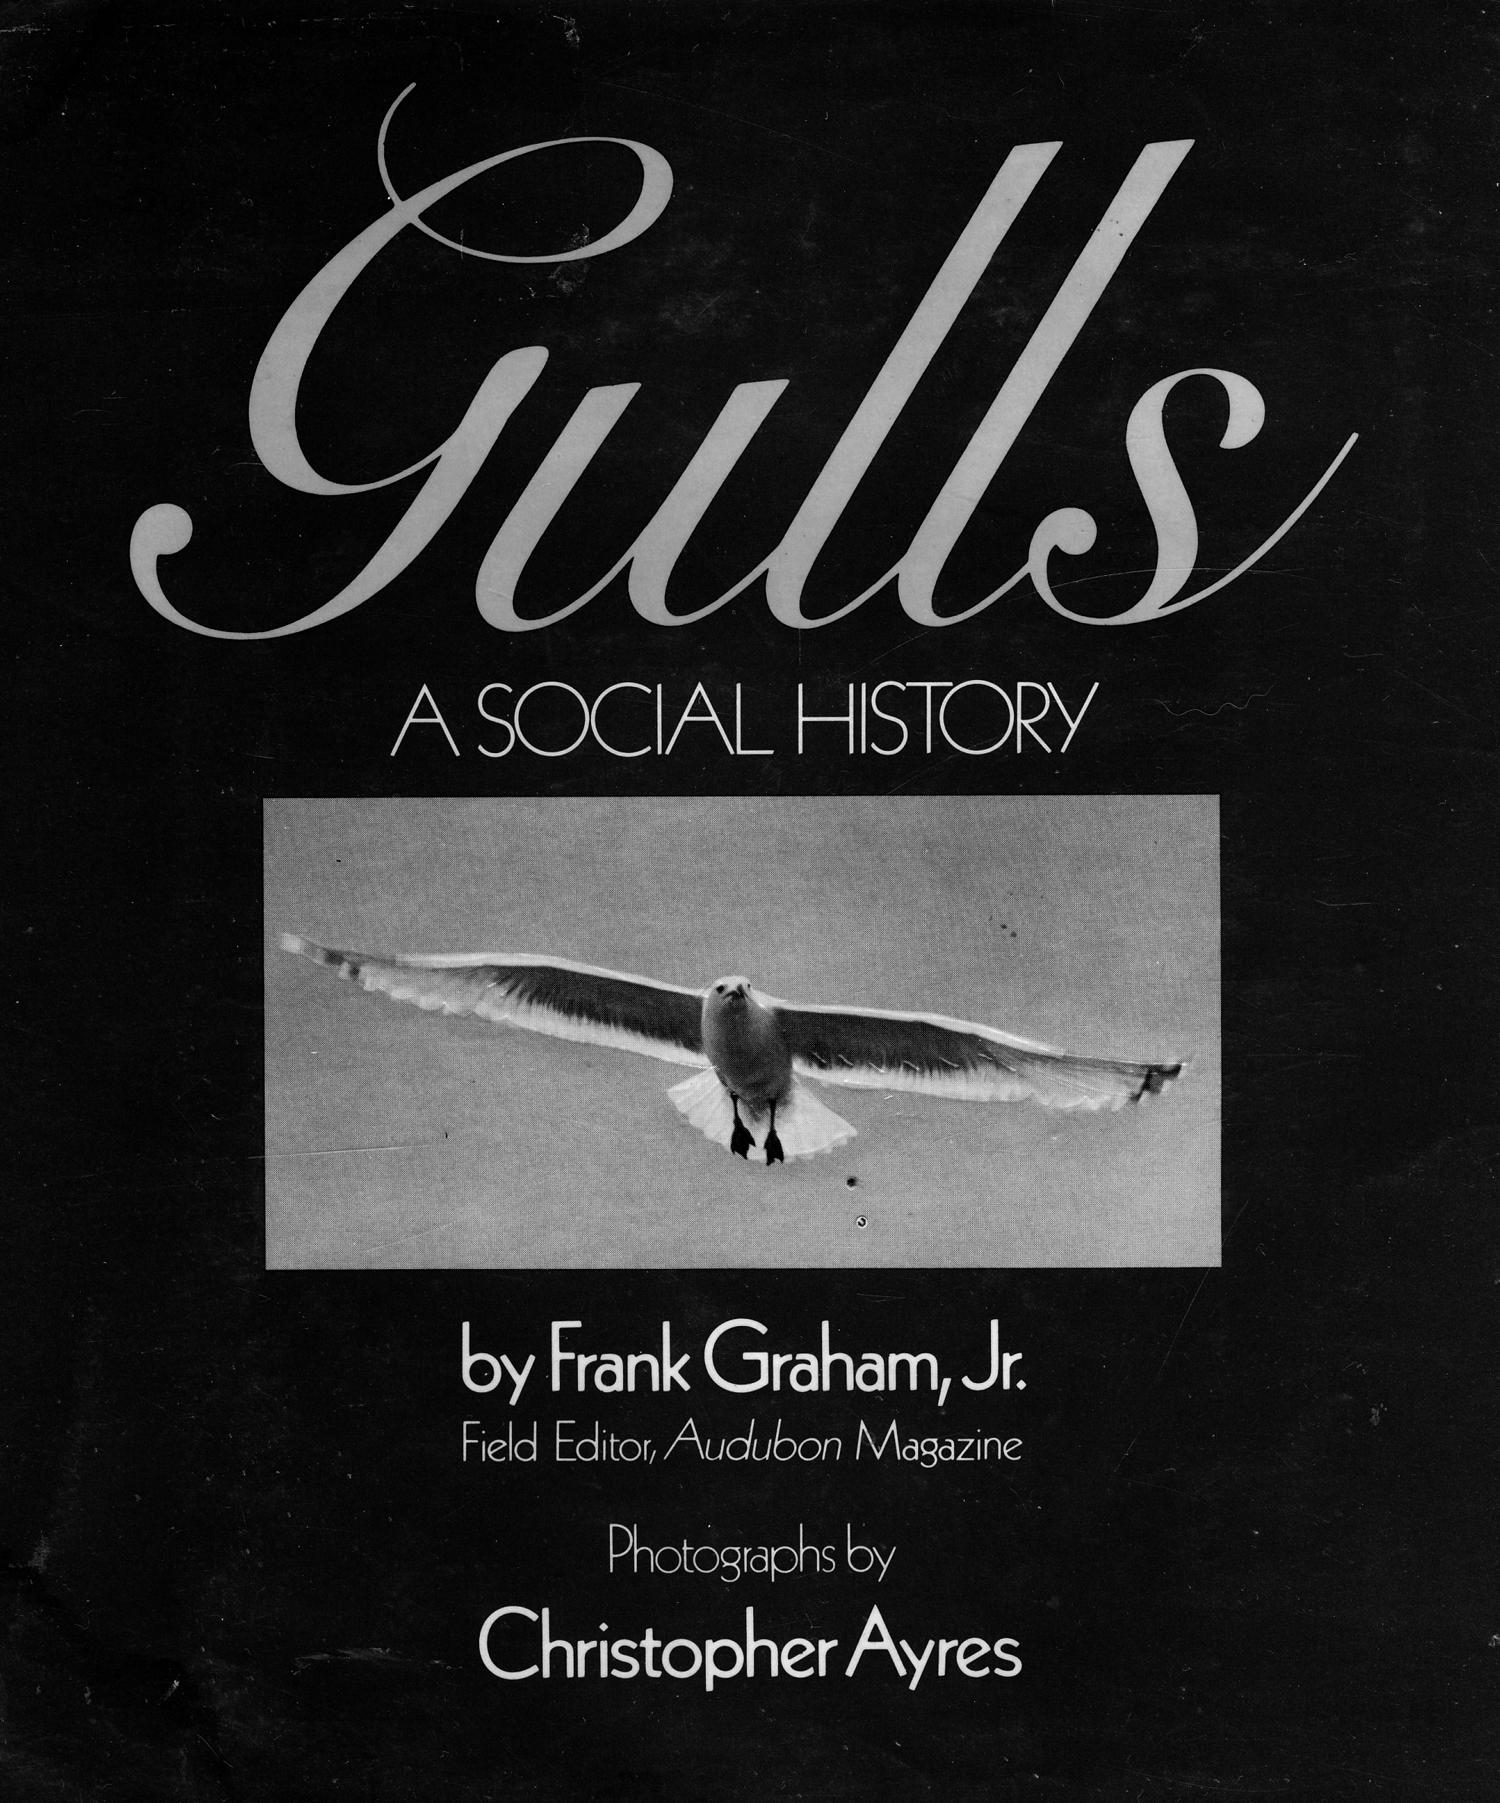 gullsbook